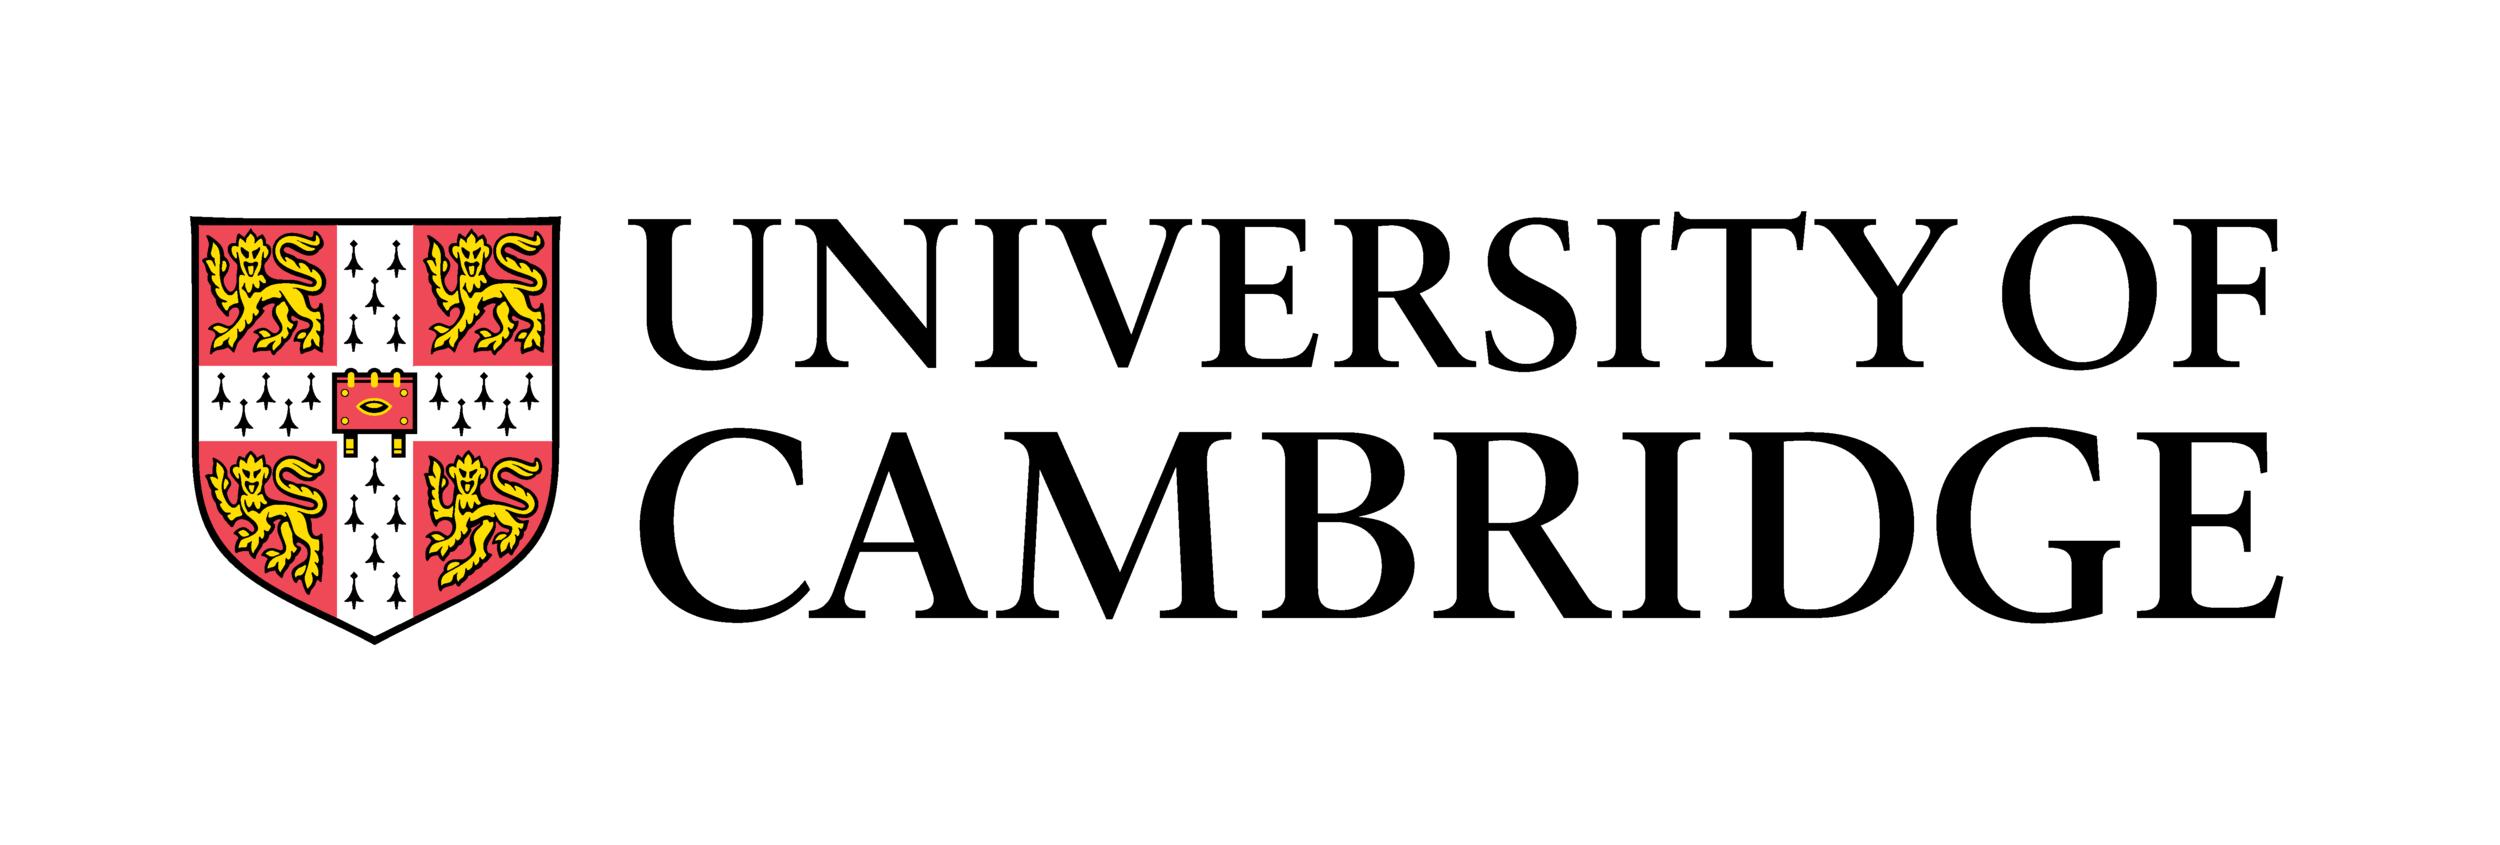 university-of-cambridge-logo.png